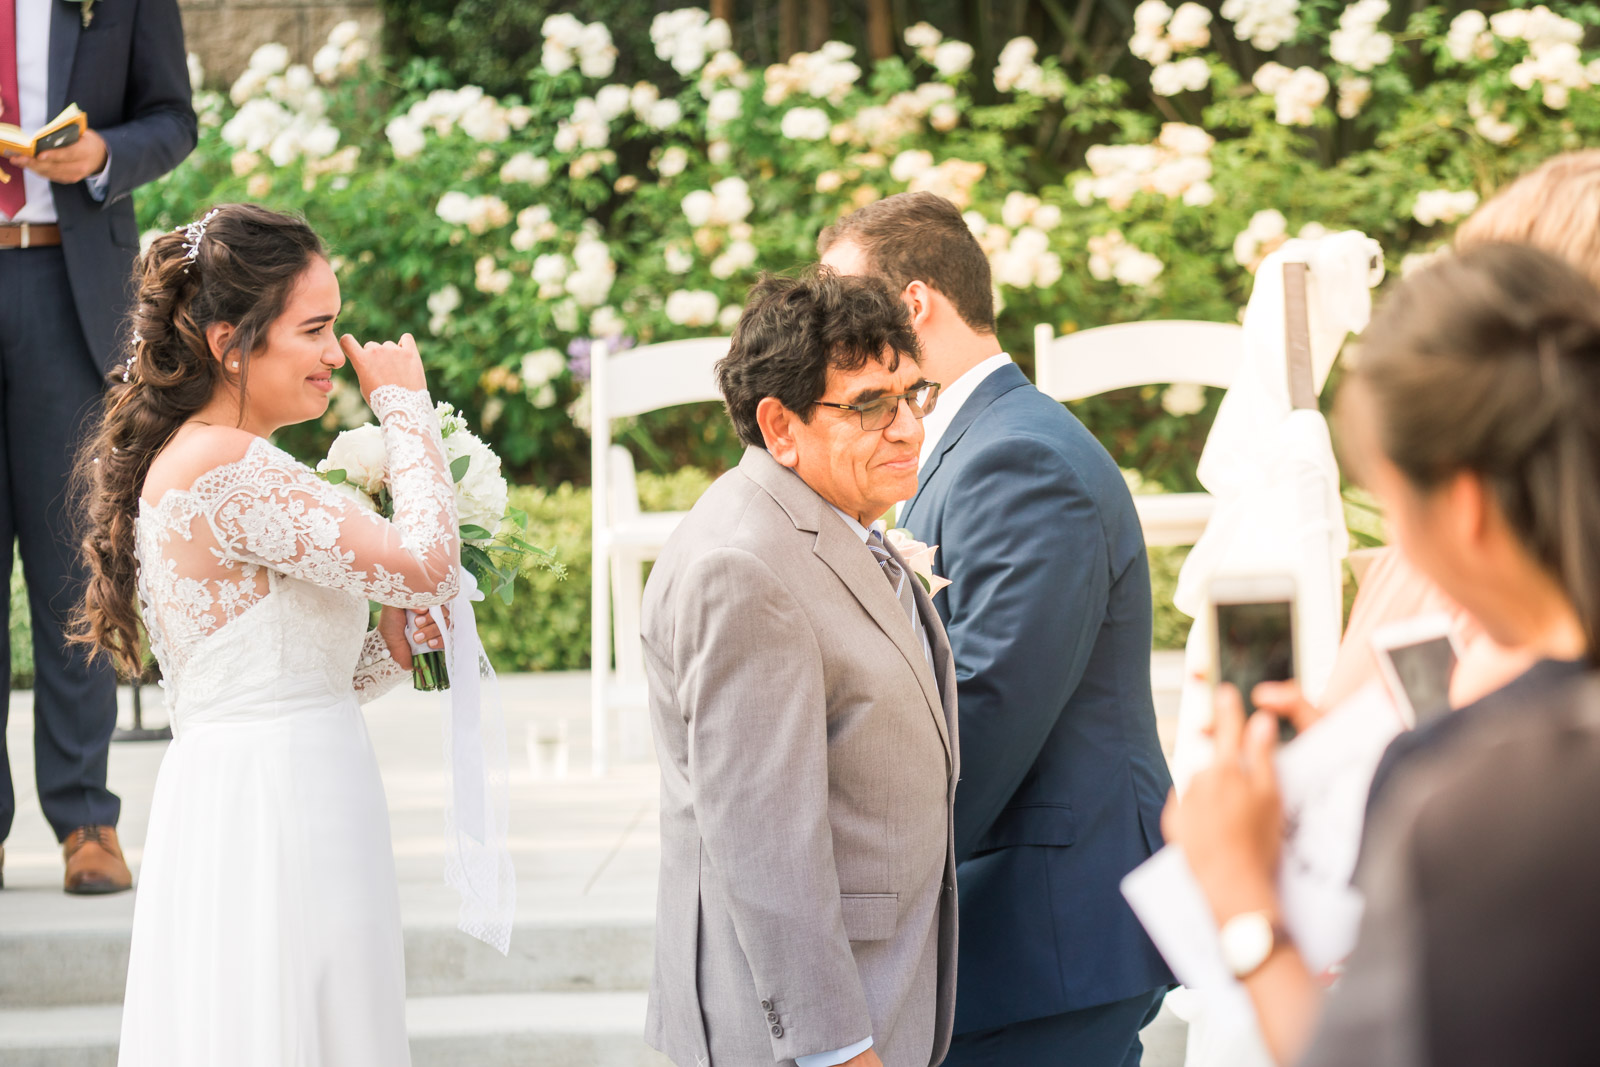 154_Angel-Brea-Orange-County_Joseph-Barber-Wedding-Photography.jpg